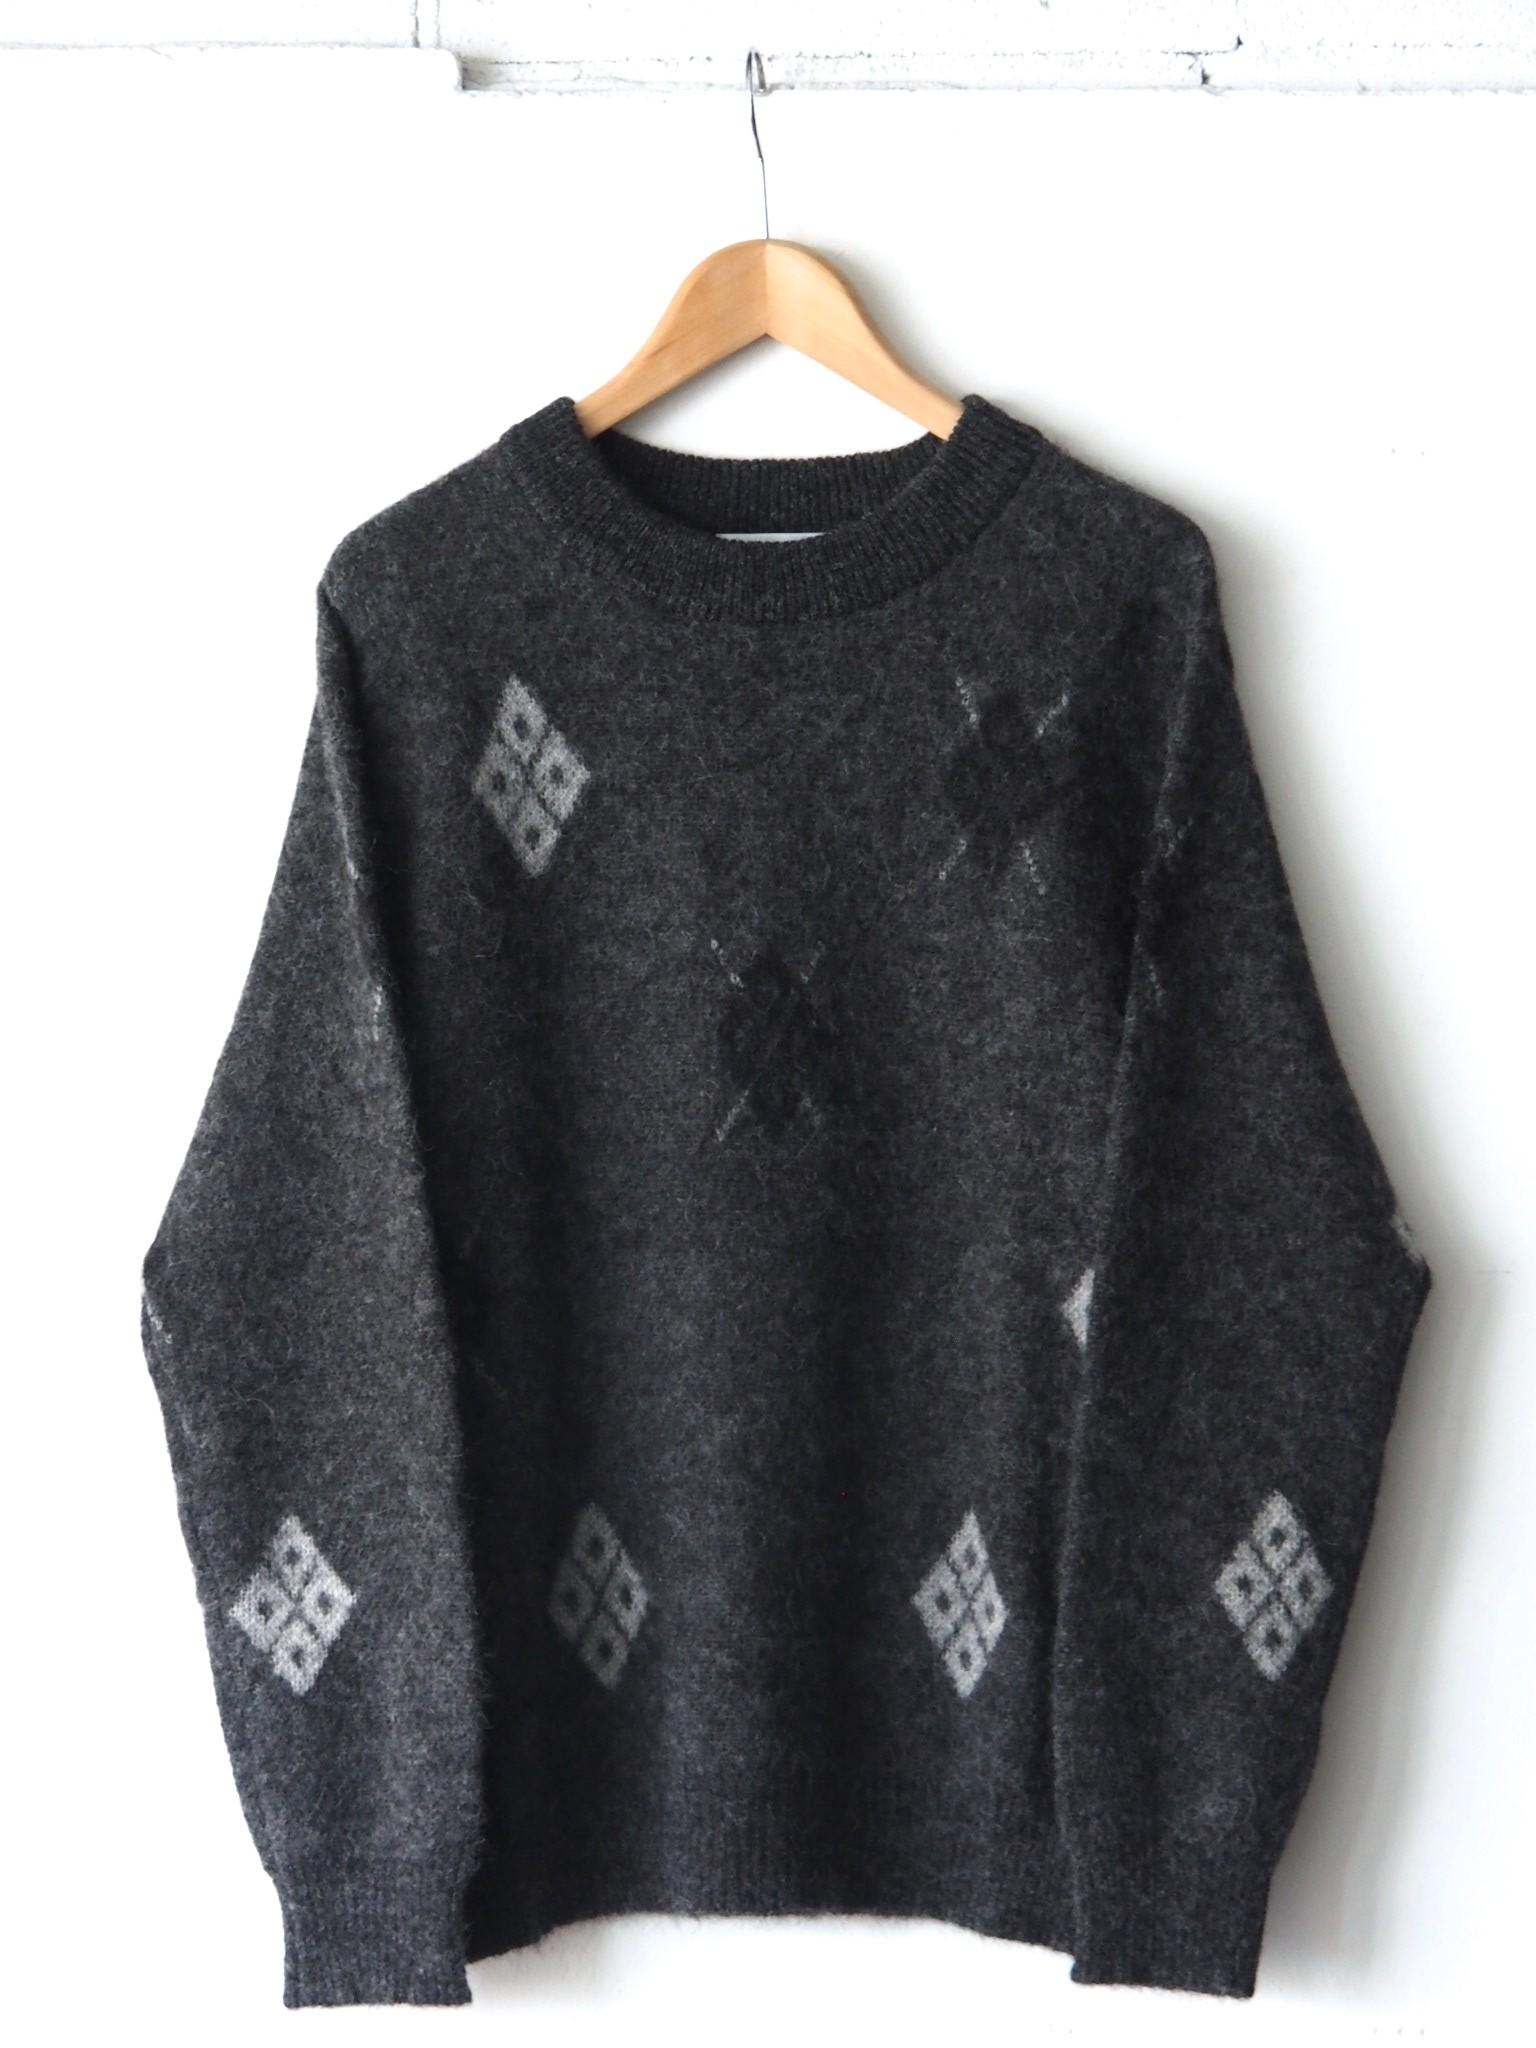 FUJITO Argyle Mohair Sweaterのご紹介です